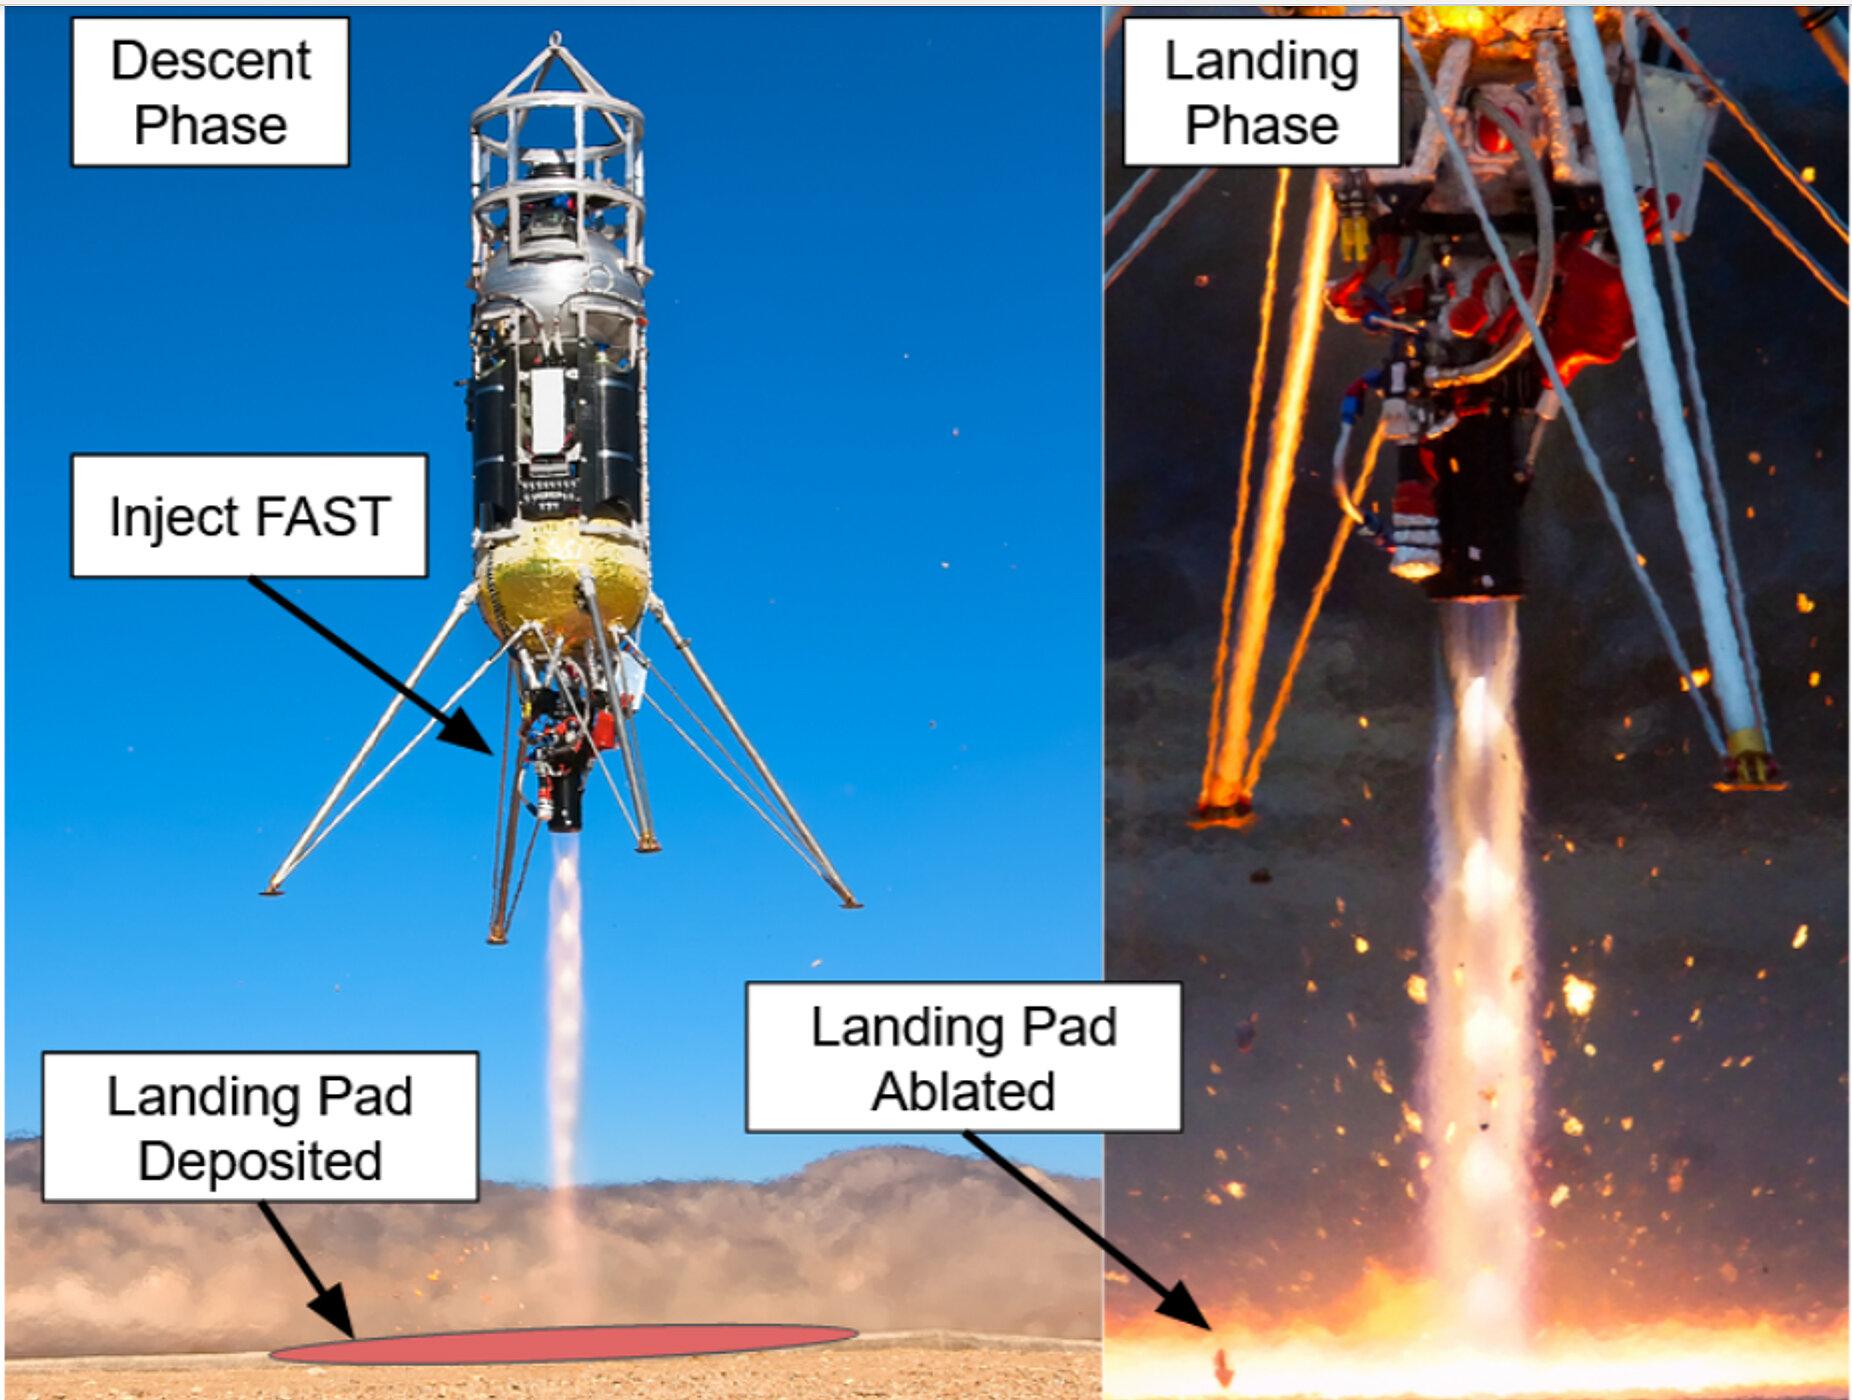 Source: Matthew Kuhns, Masten Space Systems Inc.